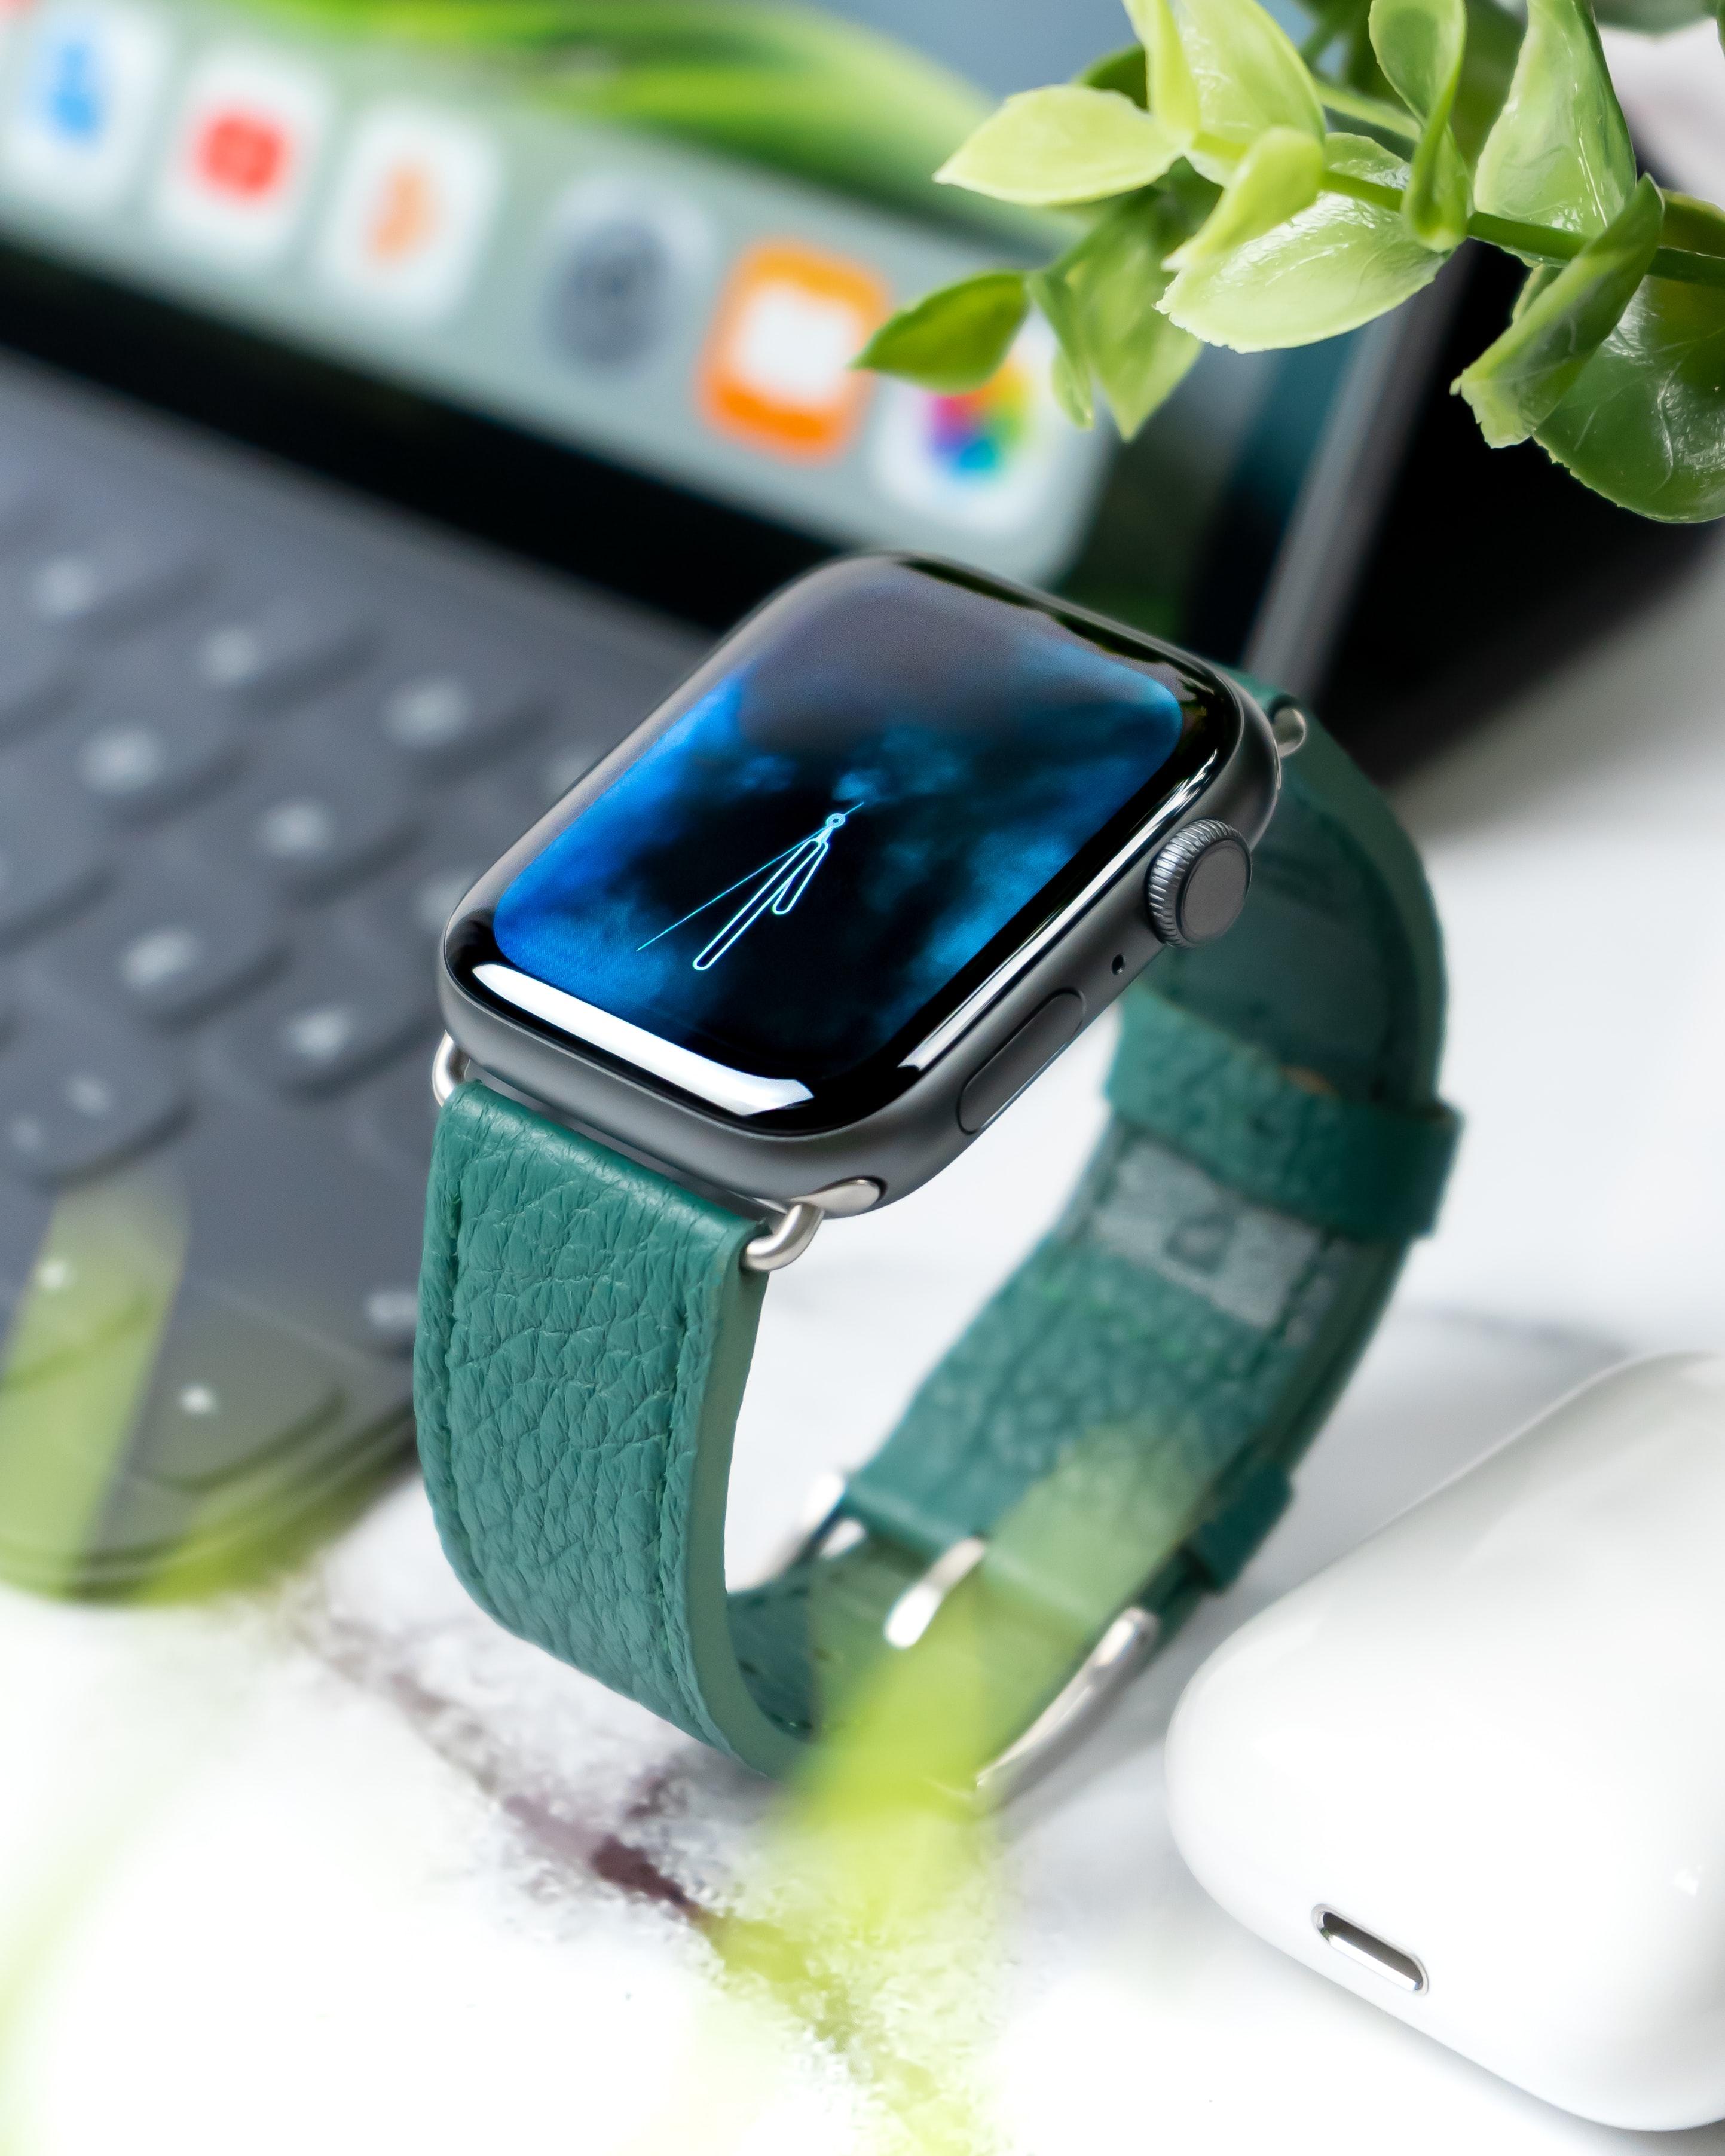 https://thomassalzano.files.wordpress.com/2021/07/thomas-salzano-encourage-and-use-green-technology-5.jpg